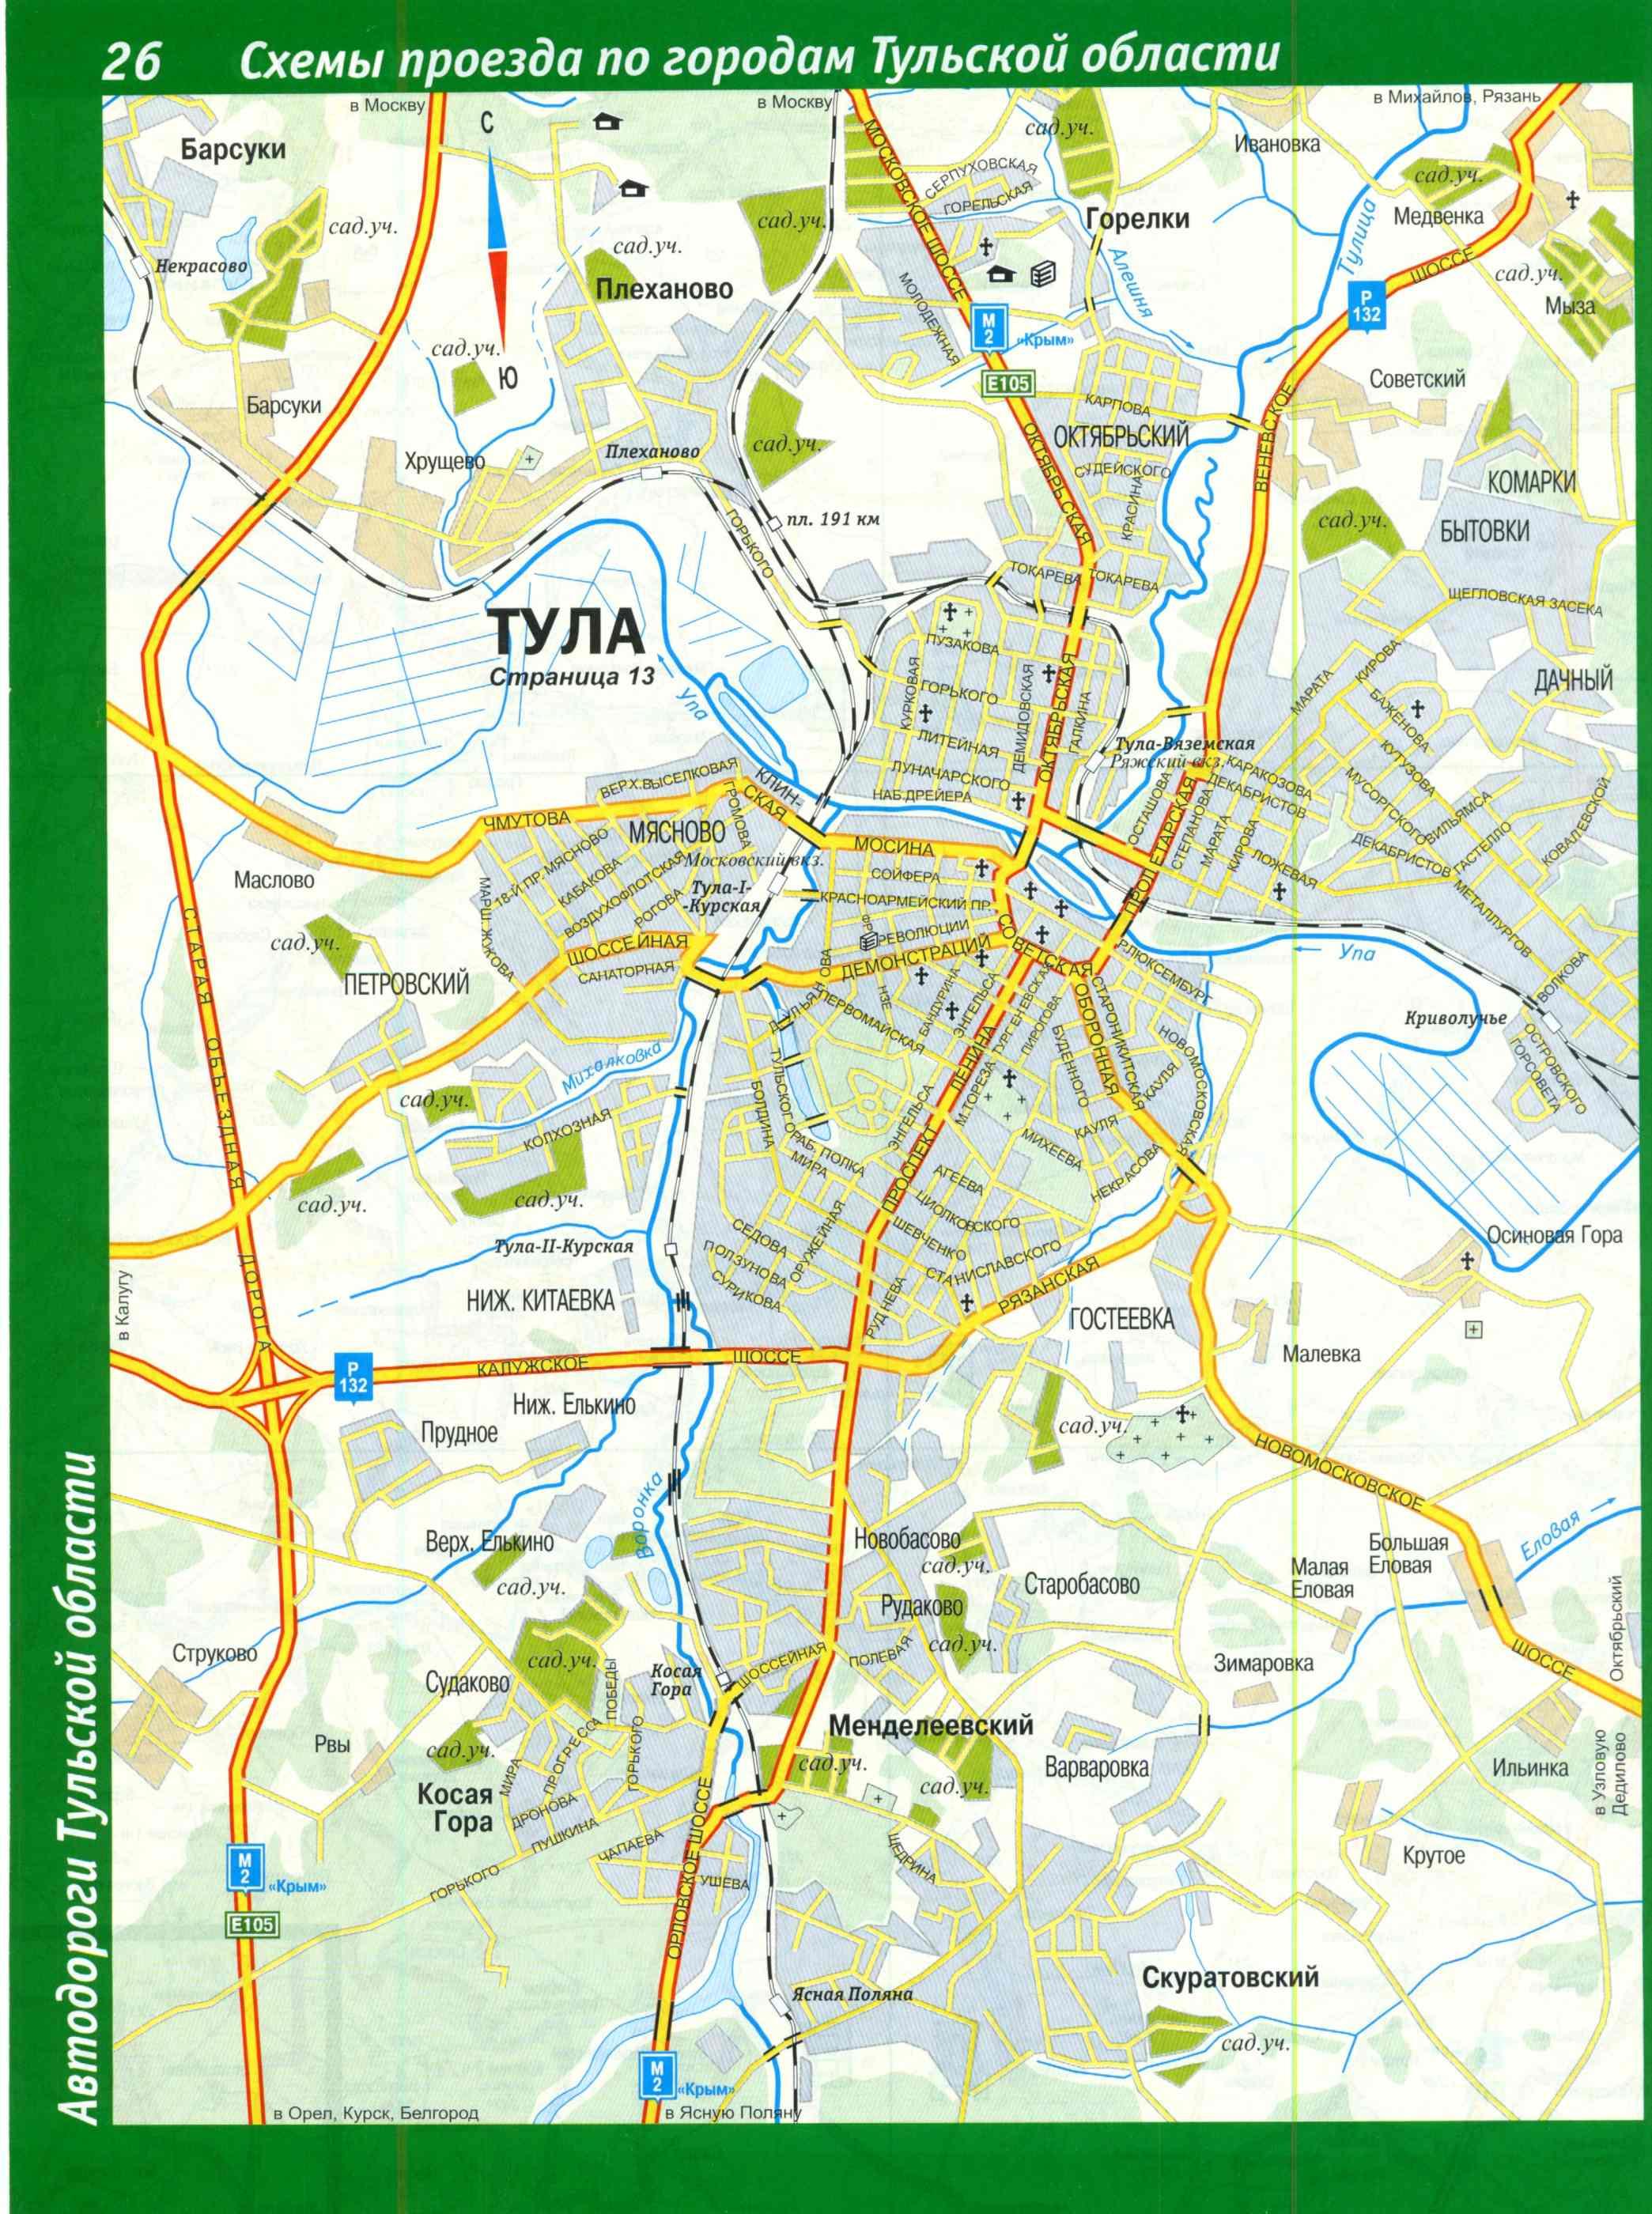 Карта улиц Тулы. Подробная карта улиц города Тула, A0: http://rf-town.ru/map1207410_0_0.htm